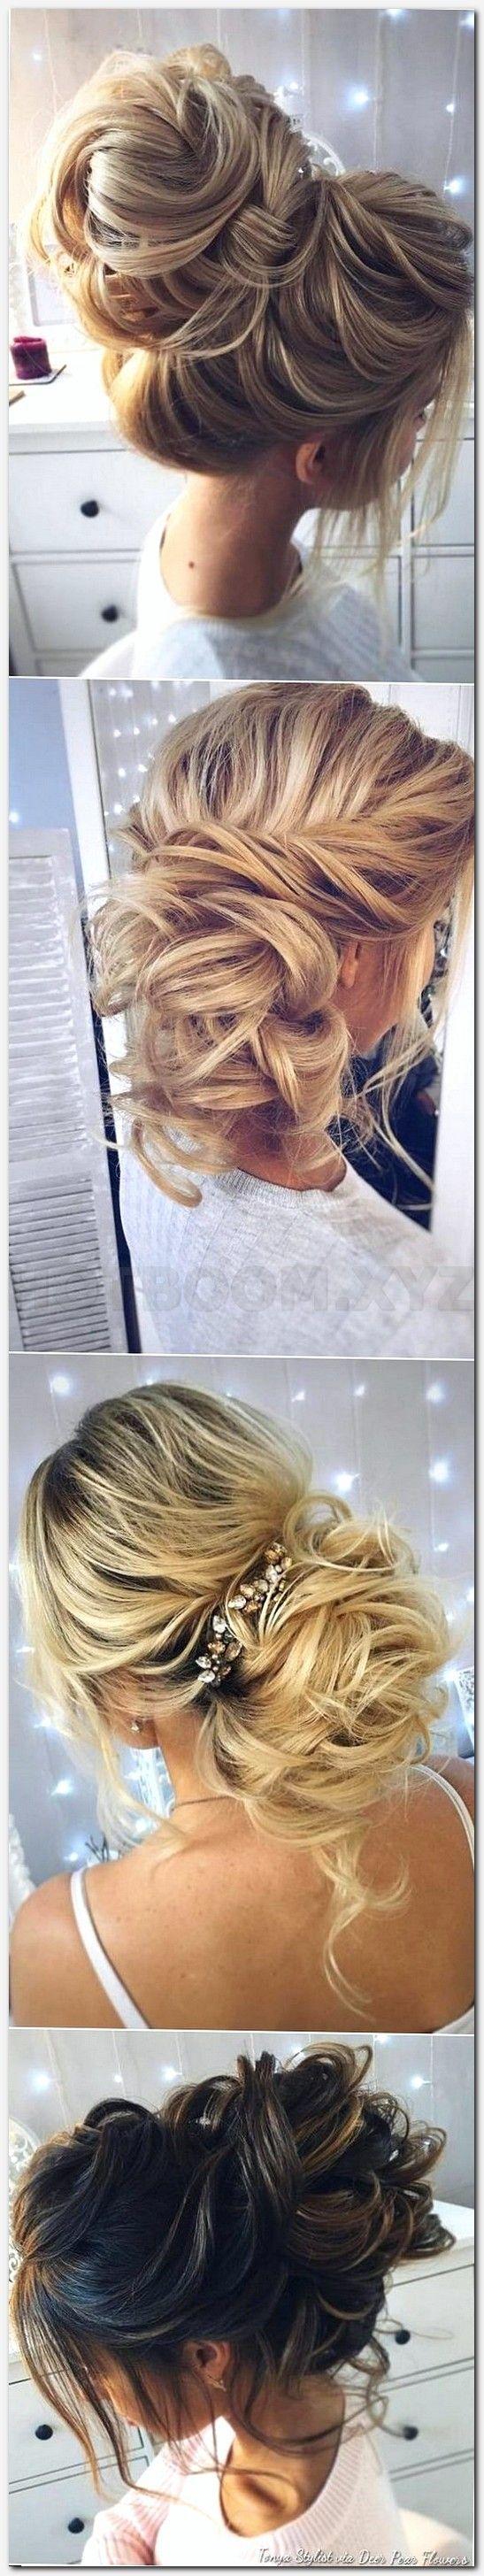 best braiding u hair styles for fine hair images on pinterest